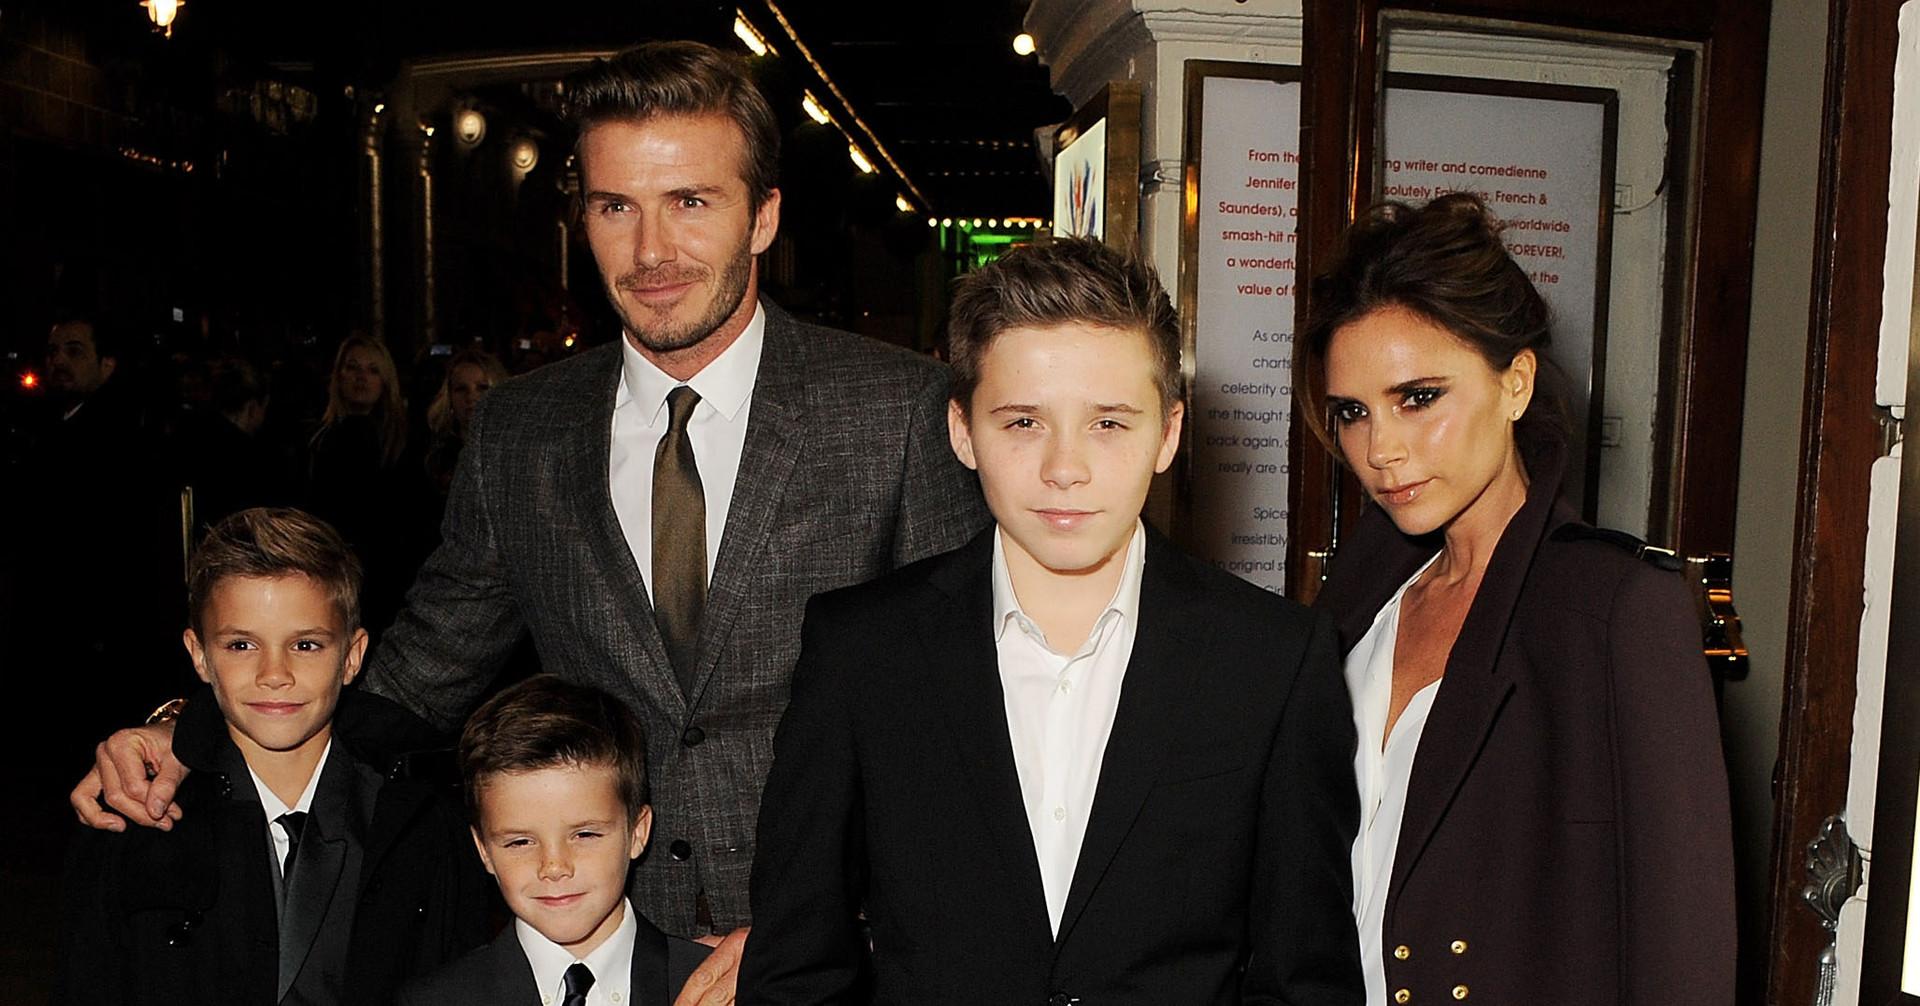 The Beckham family عائلة بيكهام